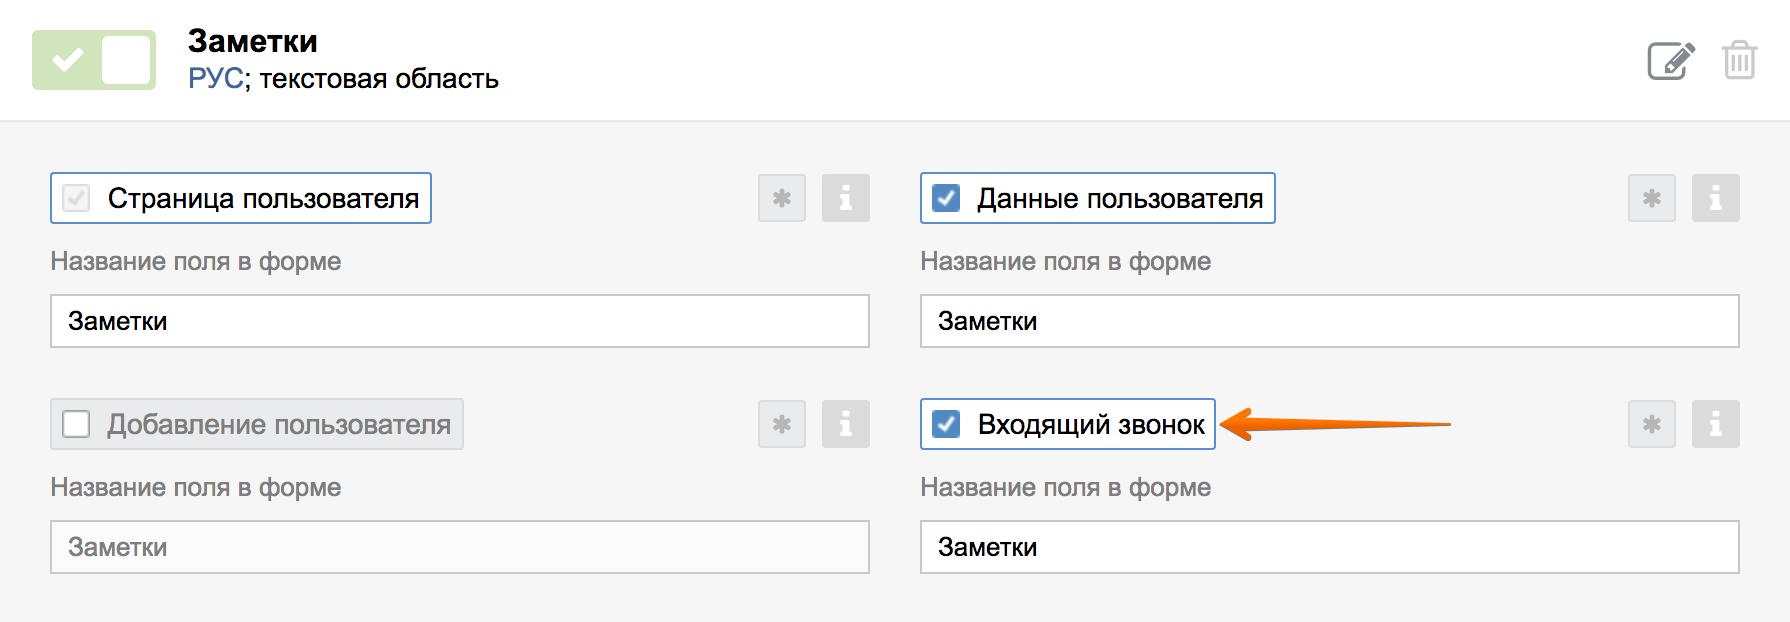 files.php?filename=d97d2c3fdc149f4ca7f2d